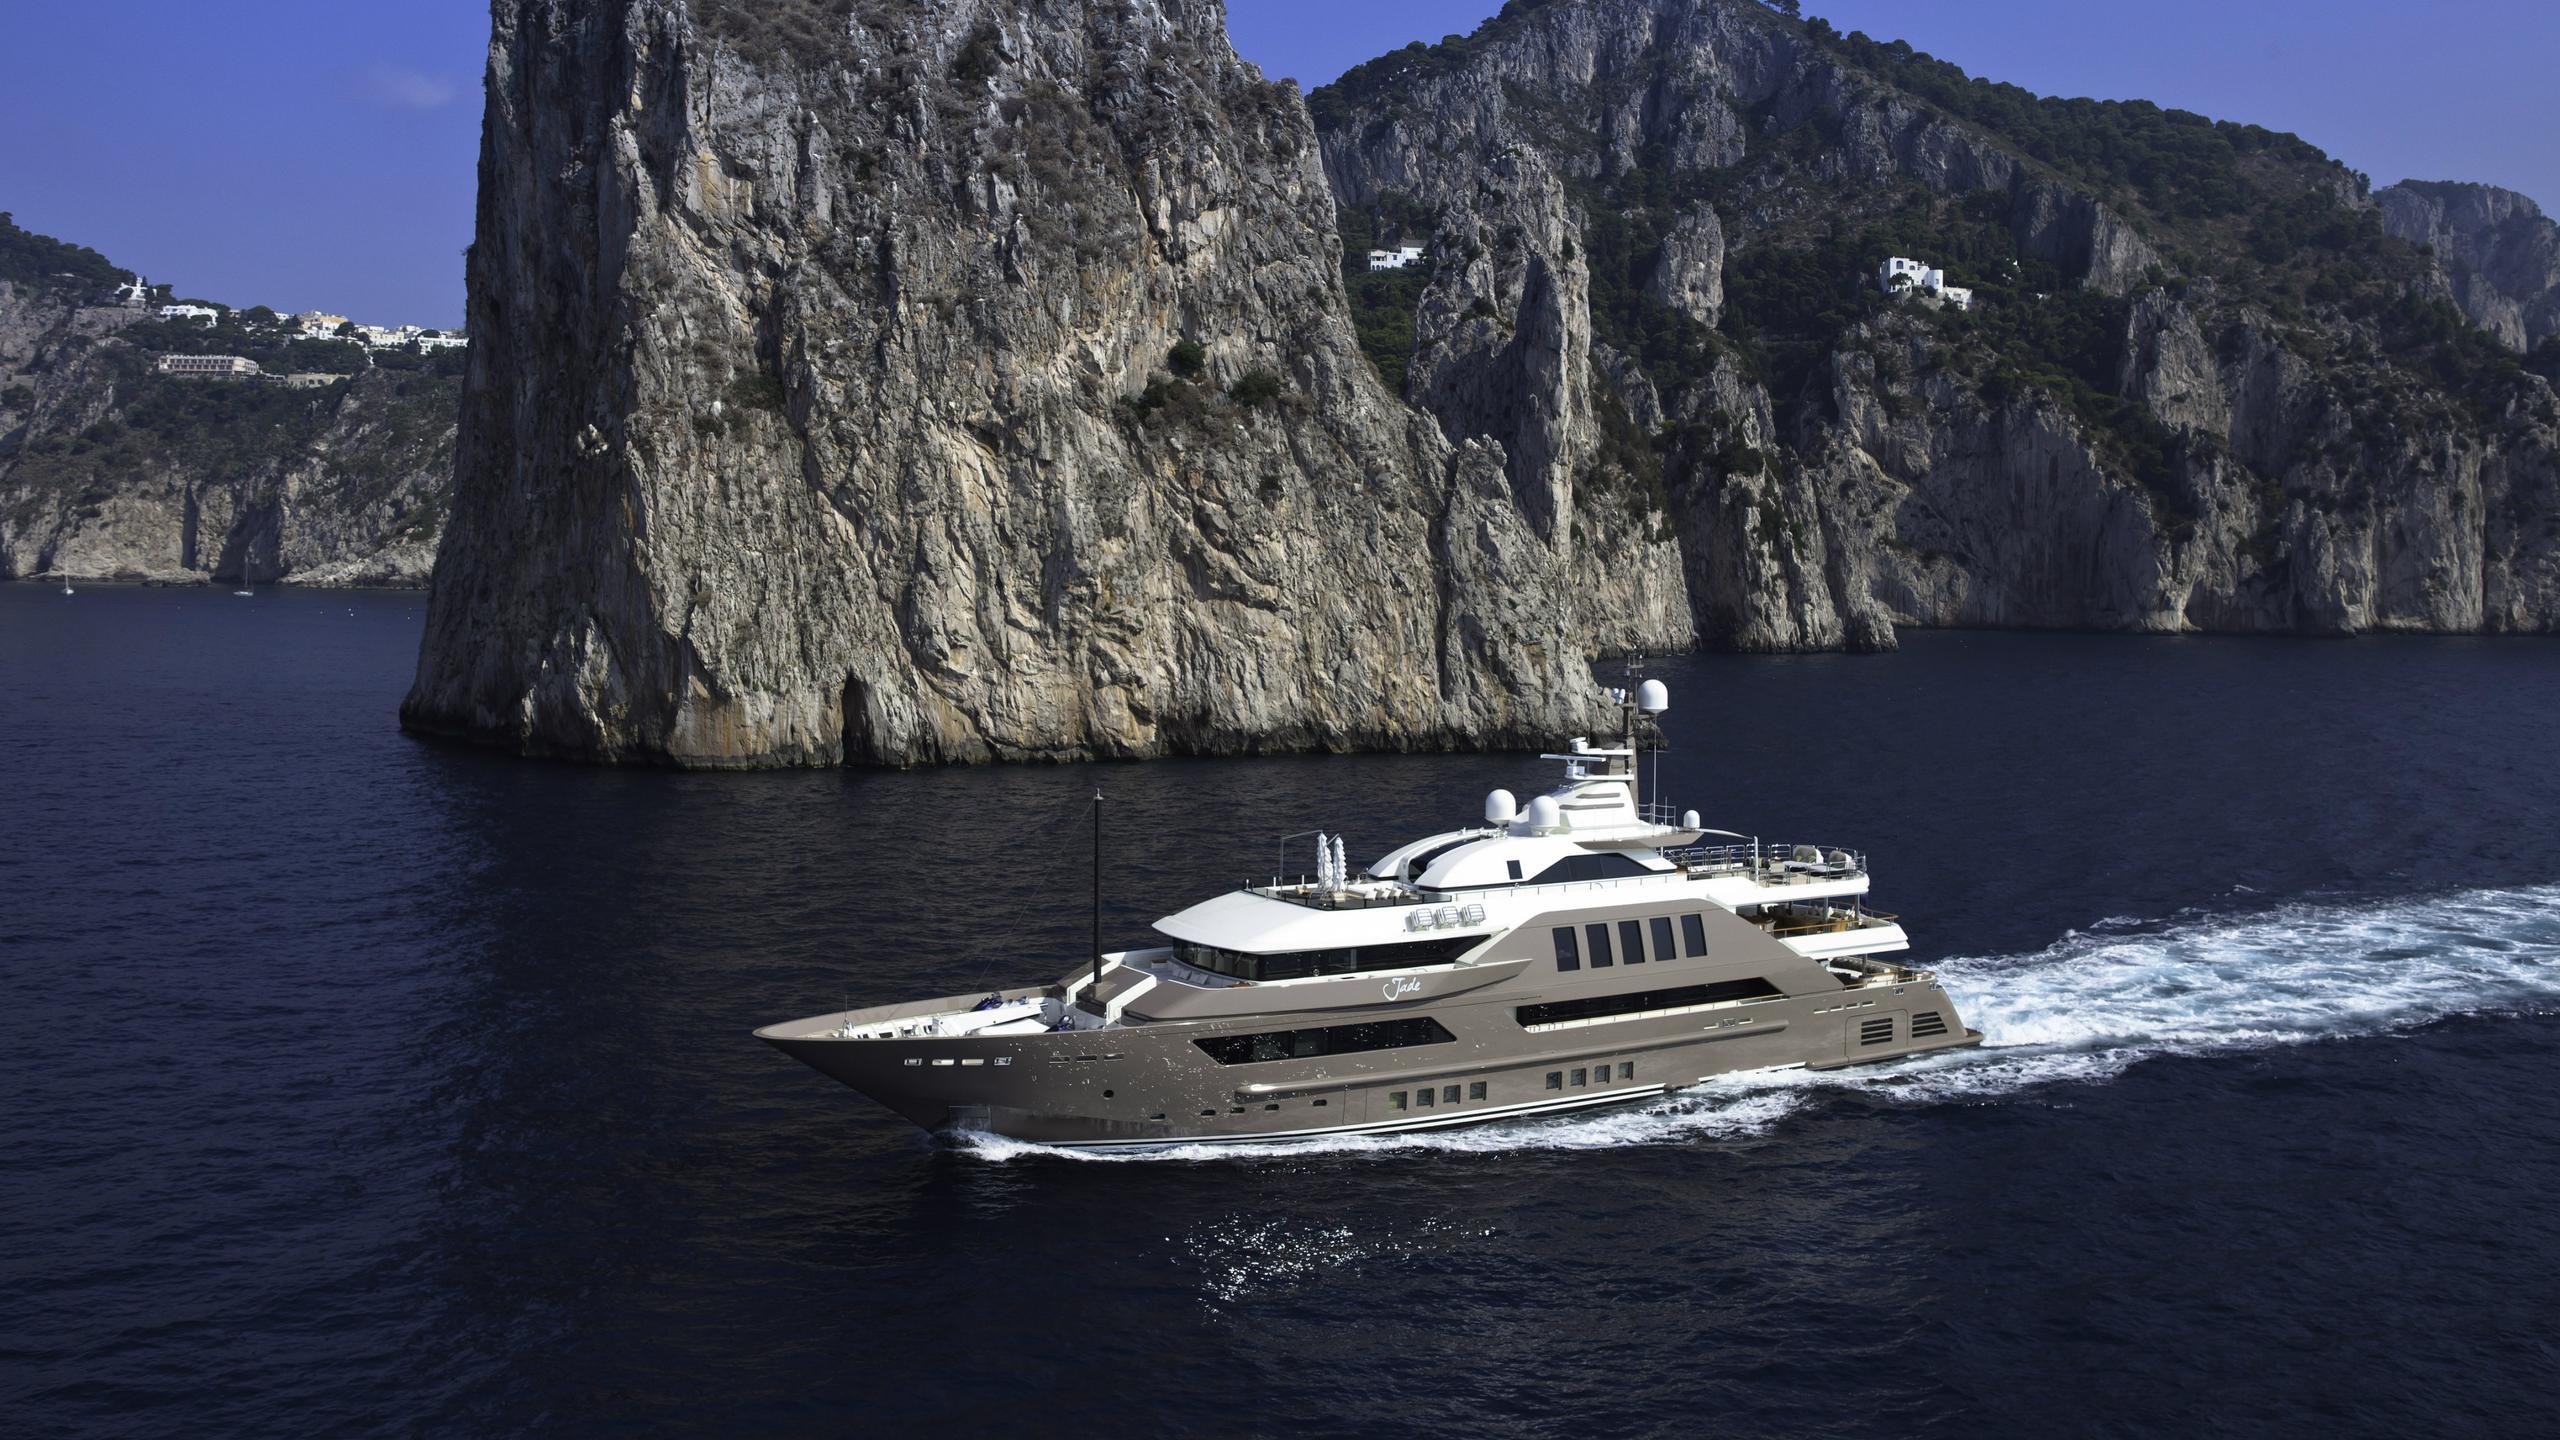 j-ade-motor-yacht-crn-2013-58m-cruising-capri